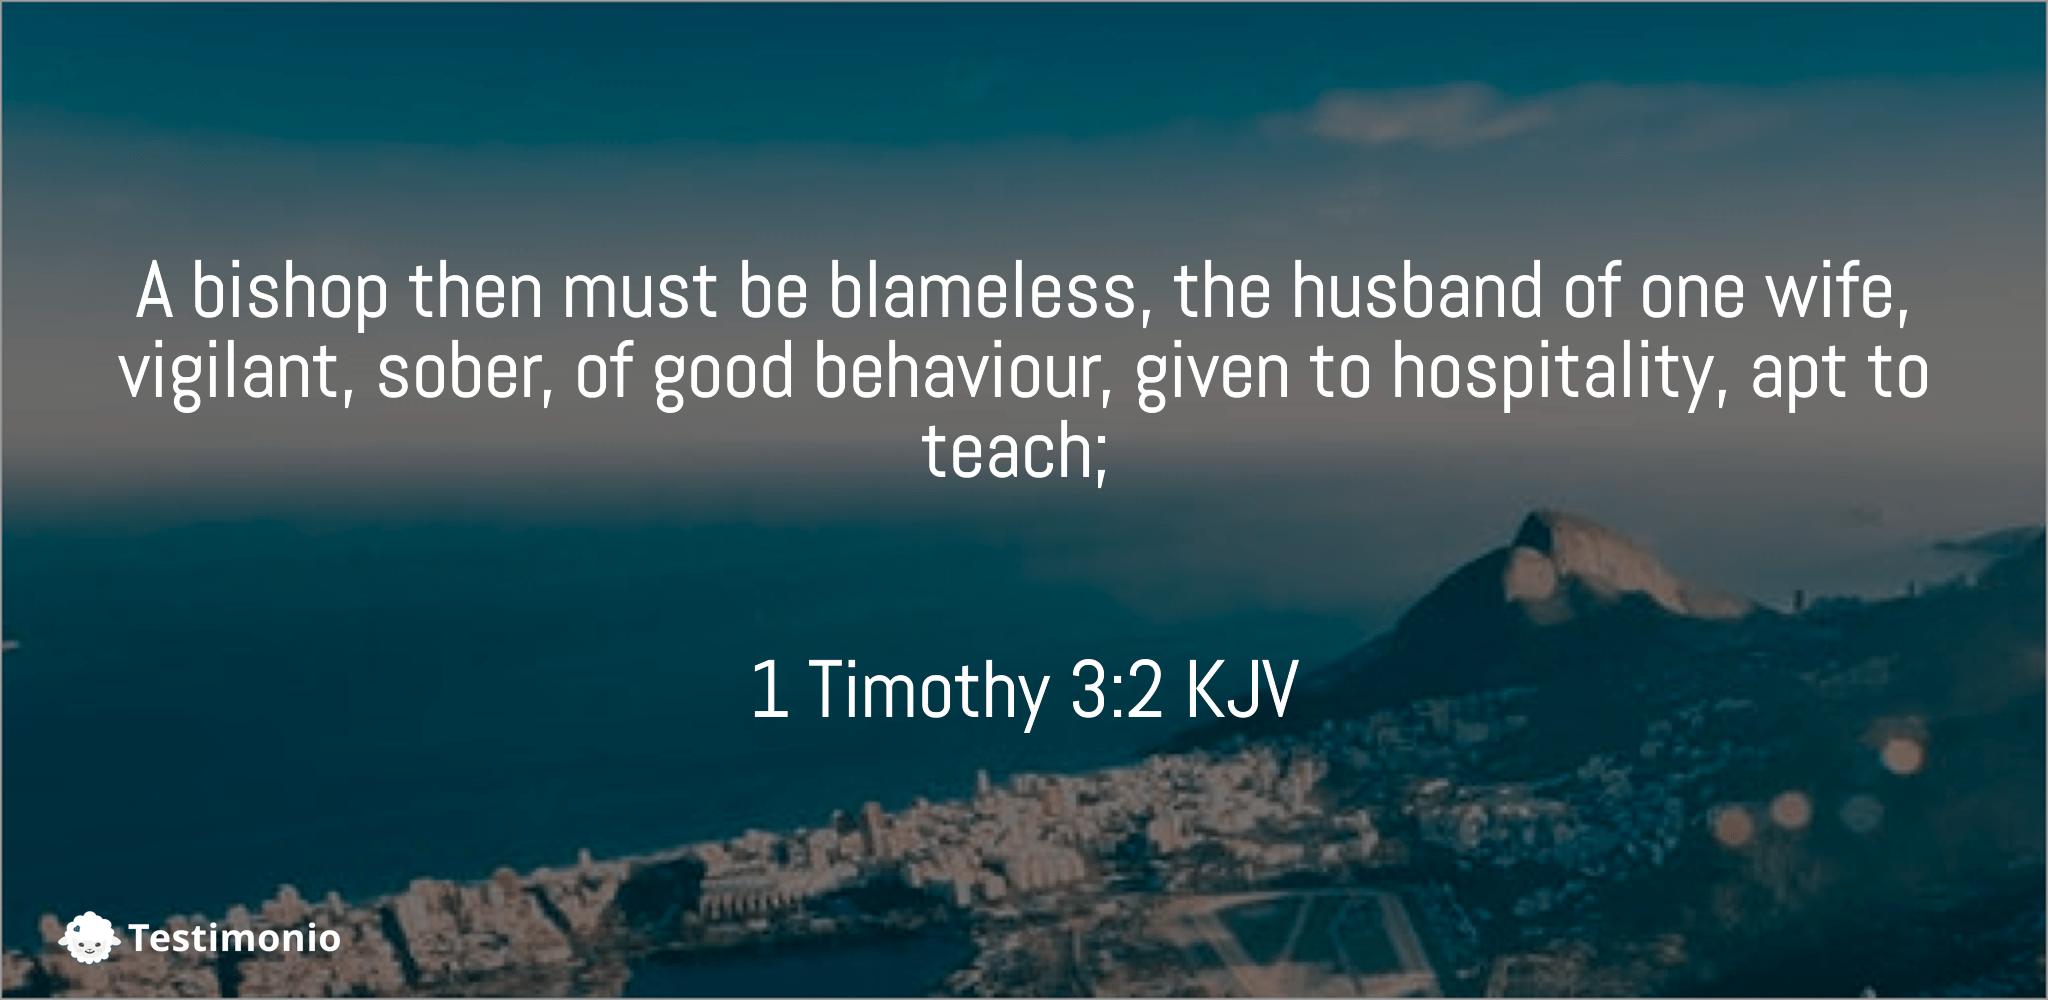 1 Timothy 3:2